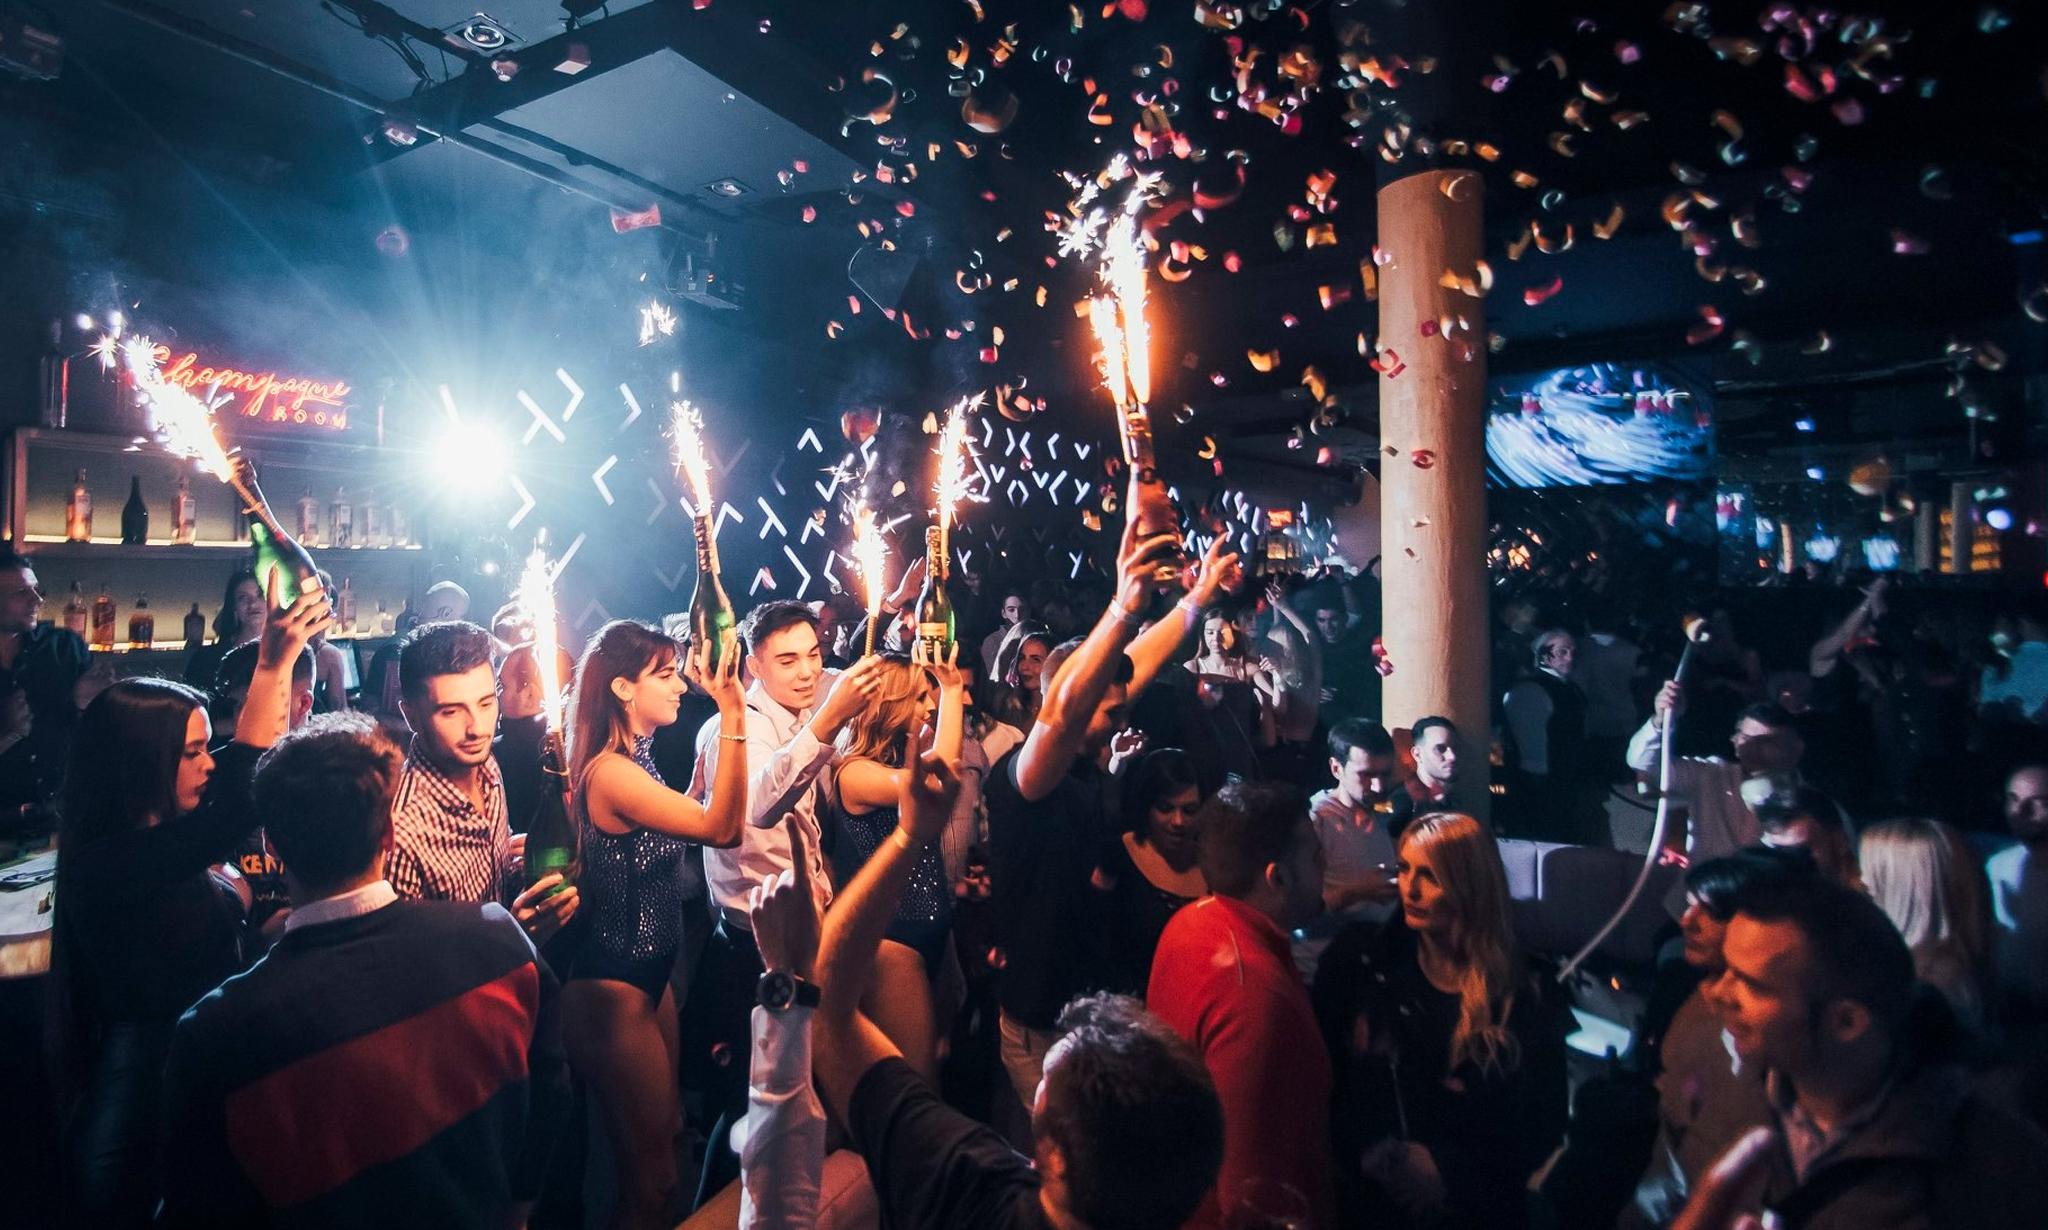 Girls In Night Club In Spain